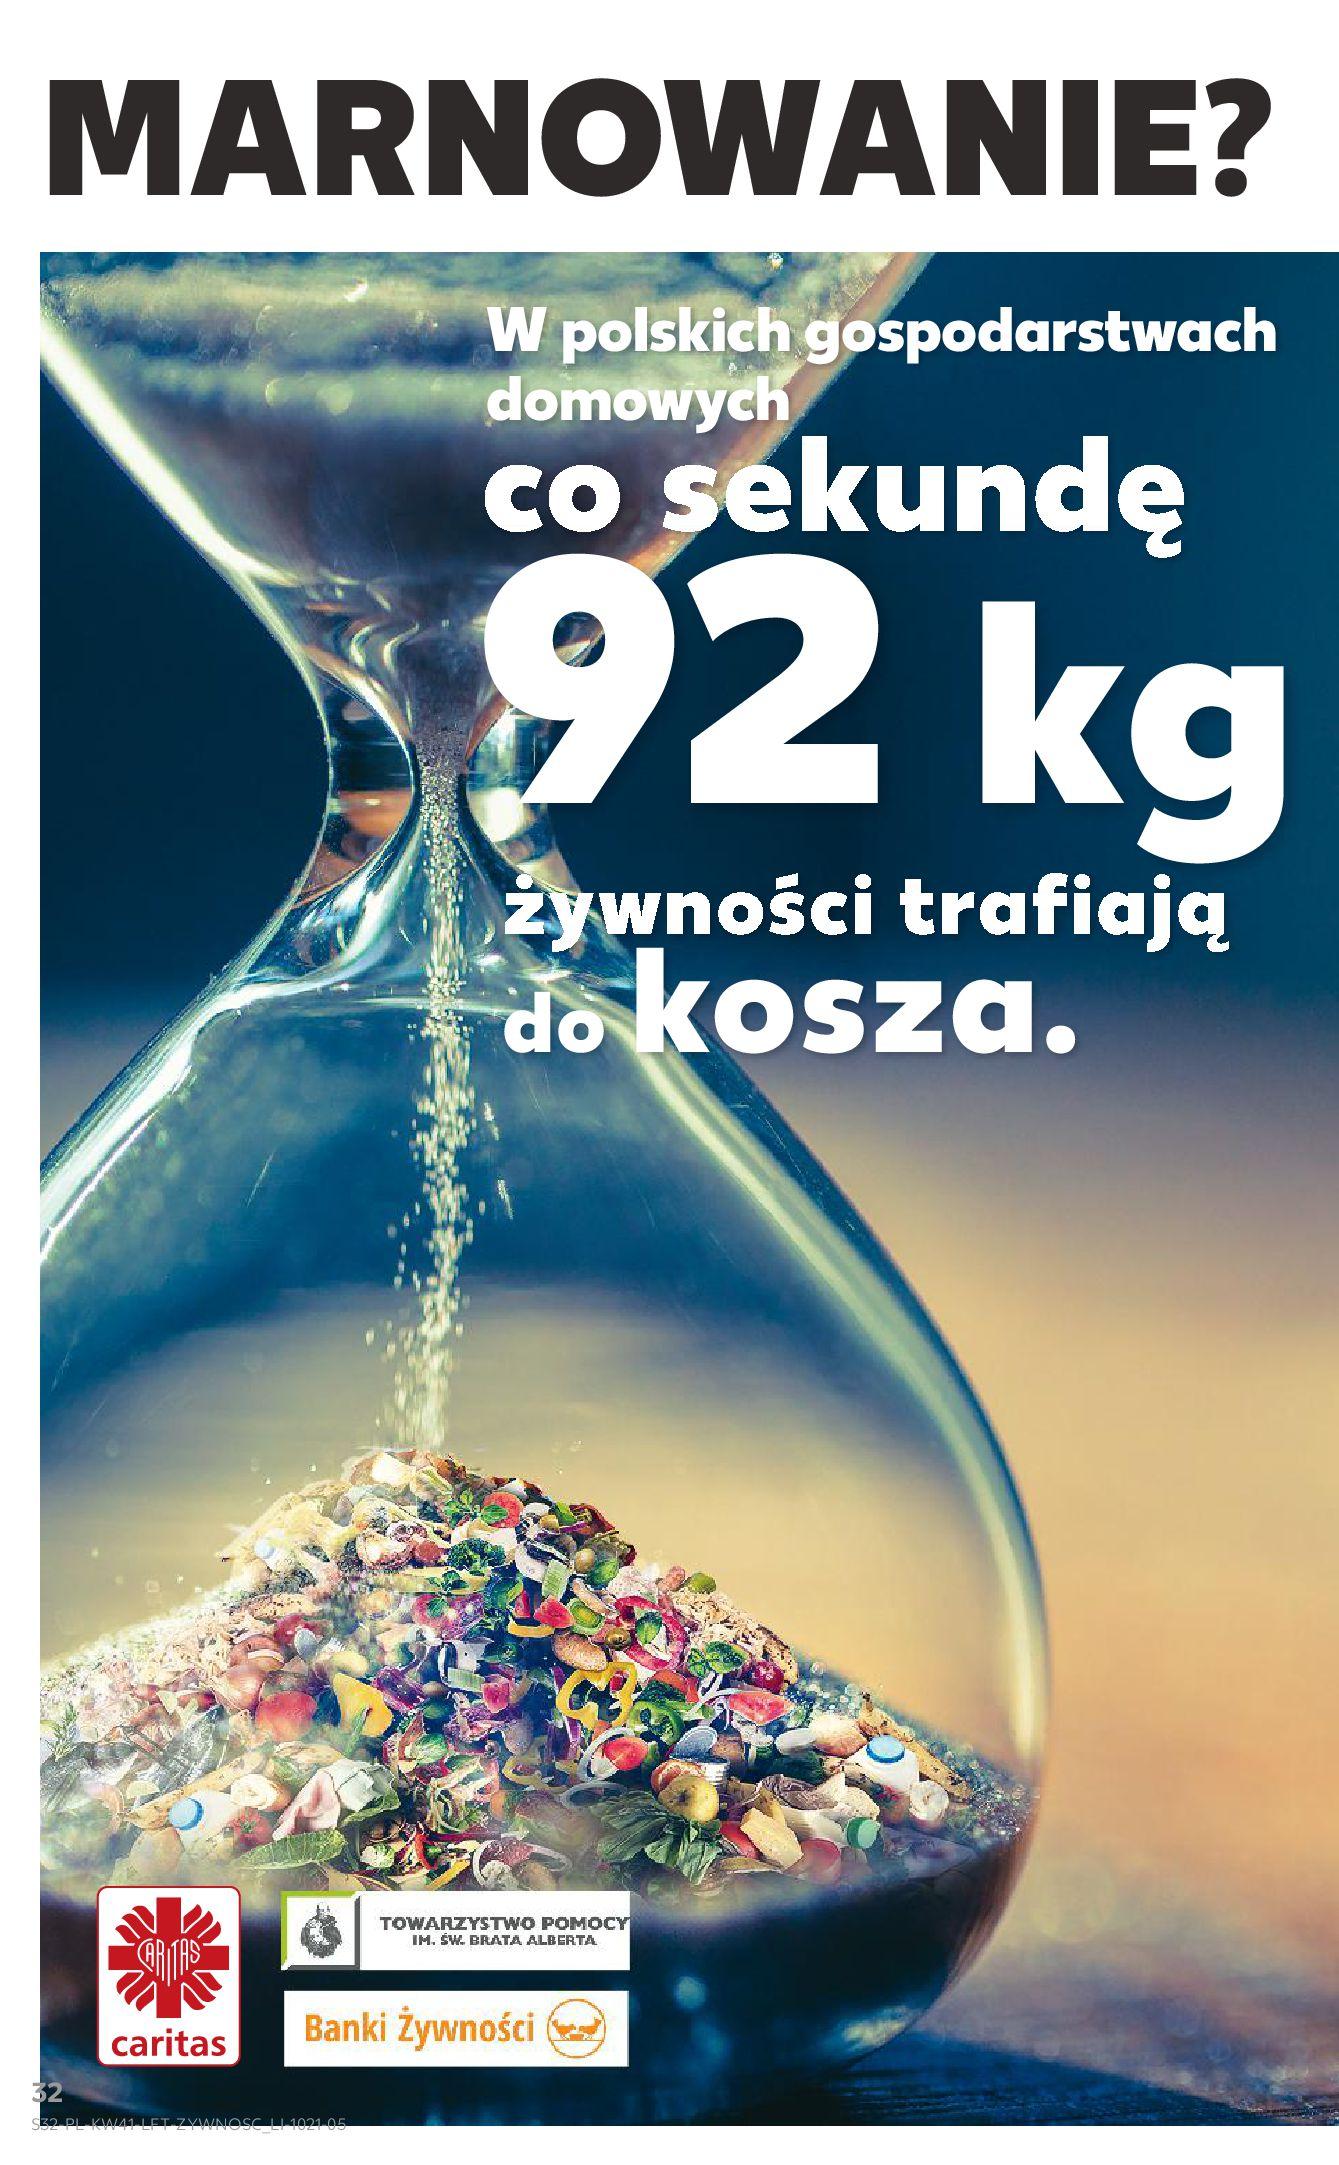 Gazetka Kaufland: Gazetka Kaufland 14-20.10. 2021-10-14 page-32